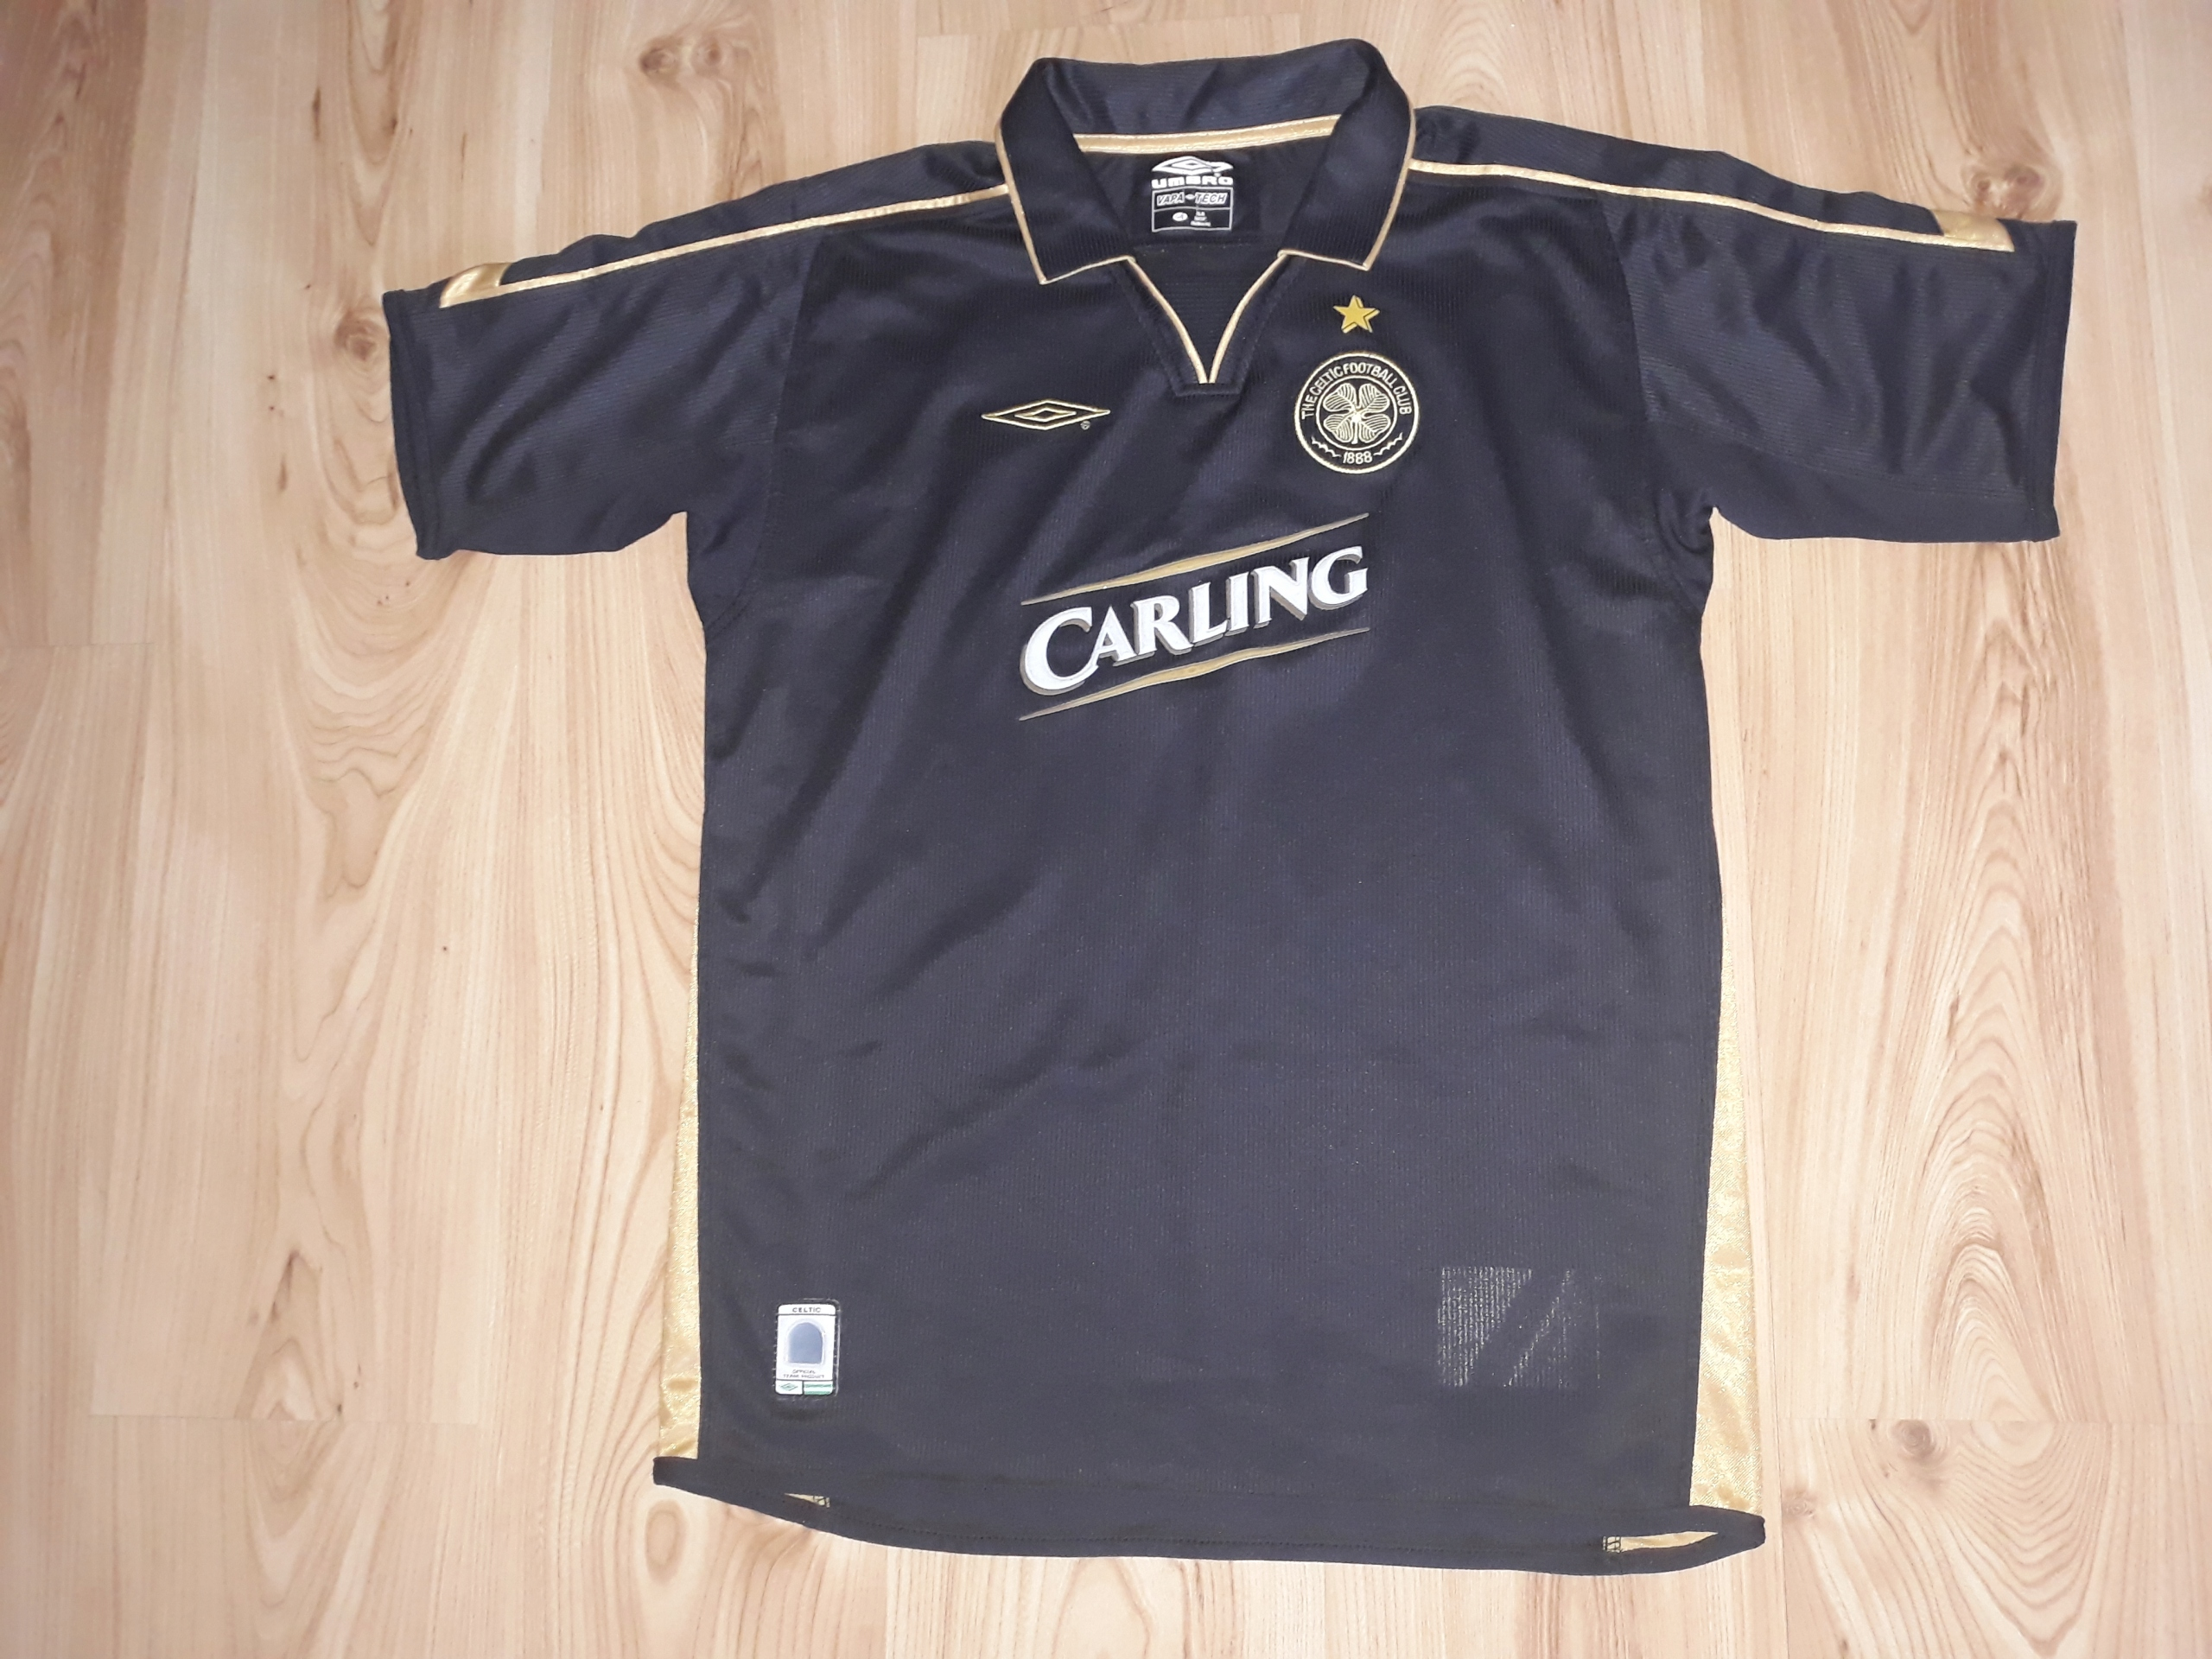 Koszulka Umbro S Celtic Glasgow Carling Szkocja